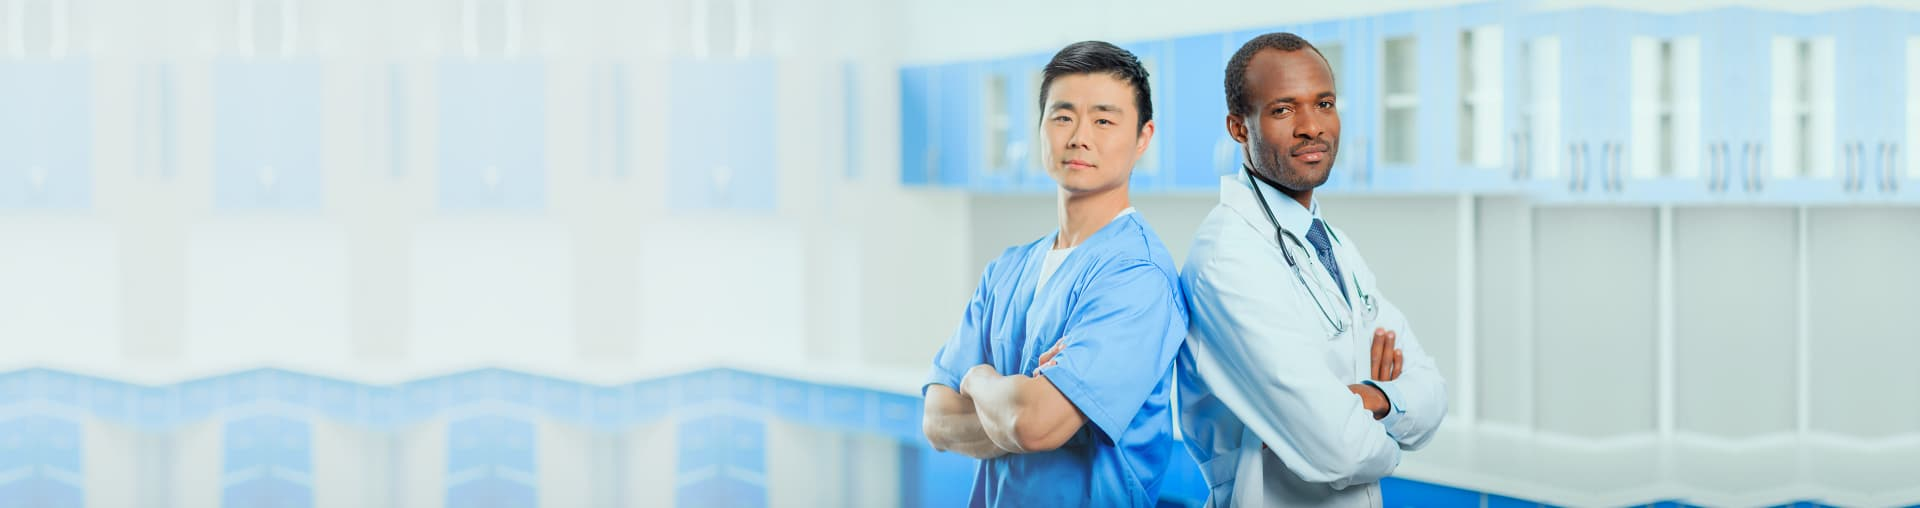 two doctors standing